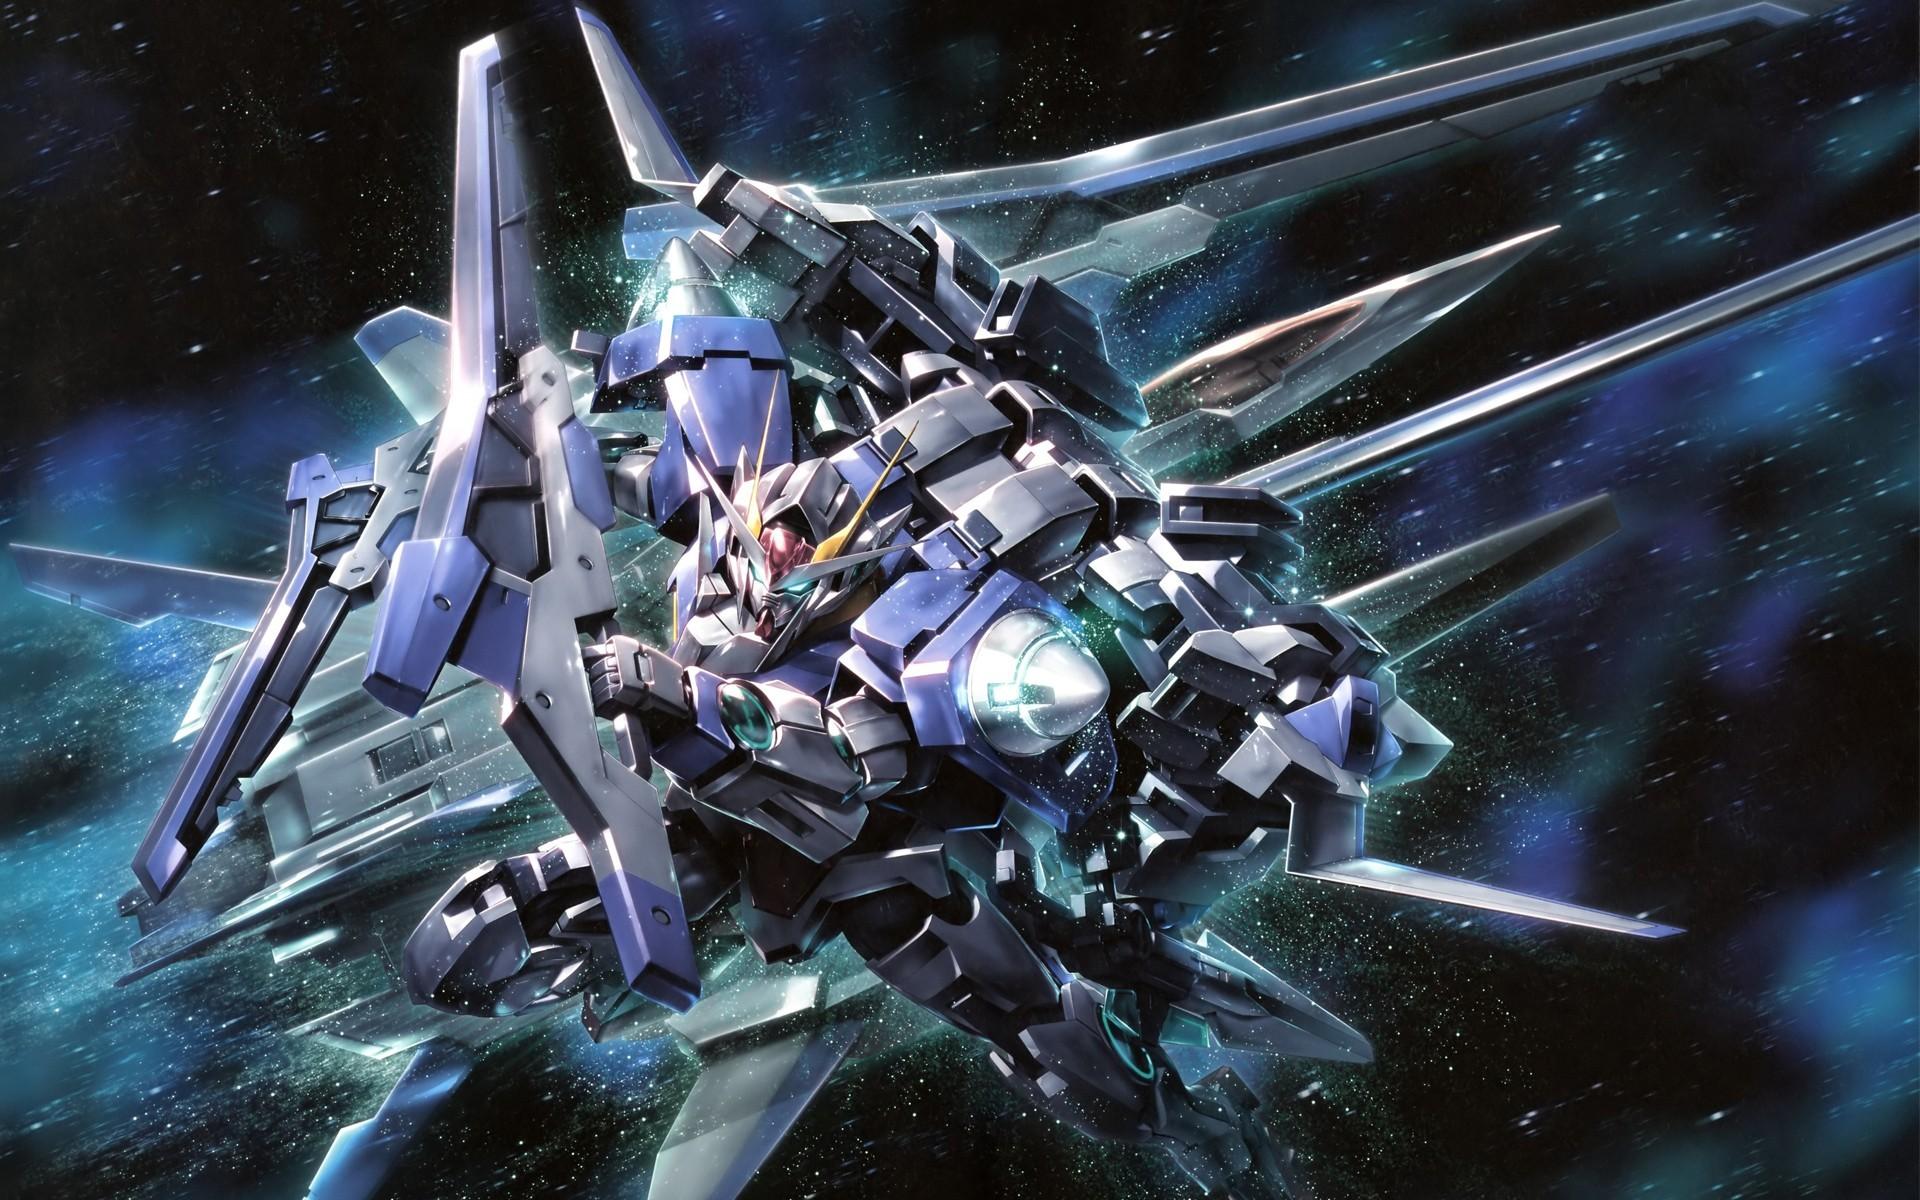 Mobile Suit Gundam 00 Anime Space Mechs Robots